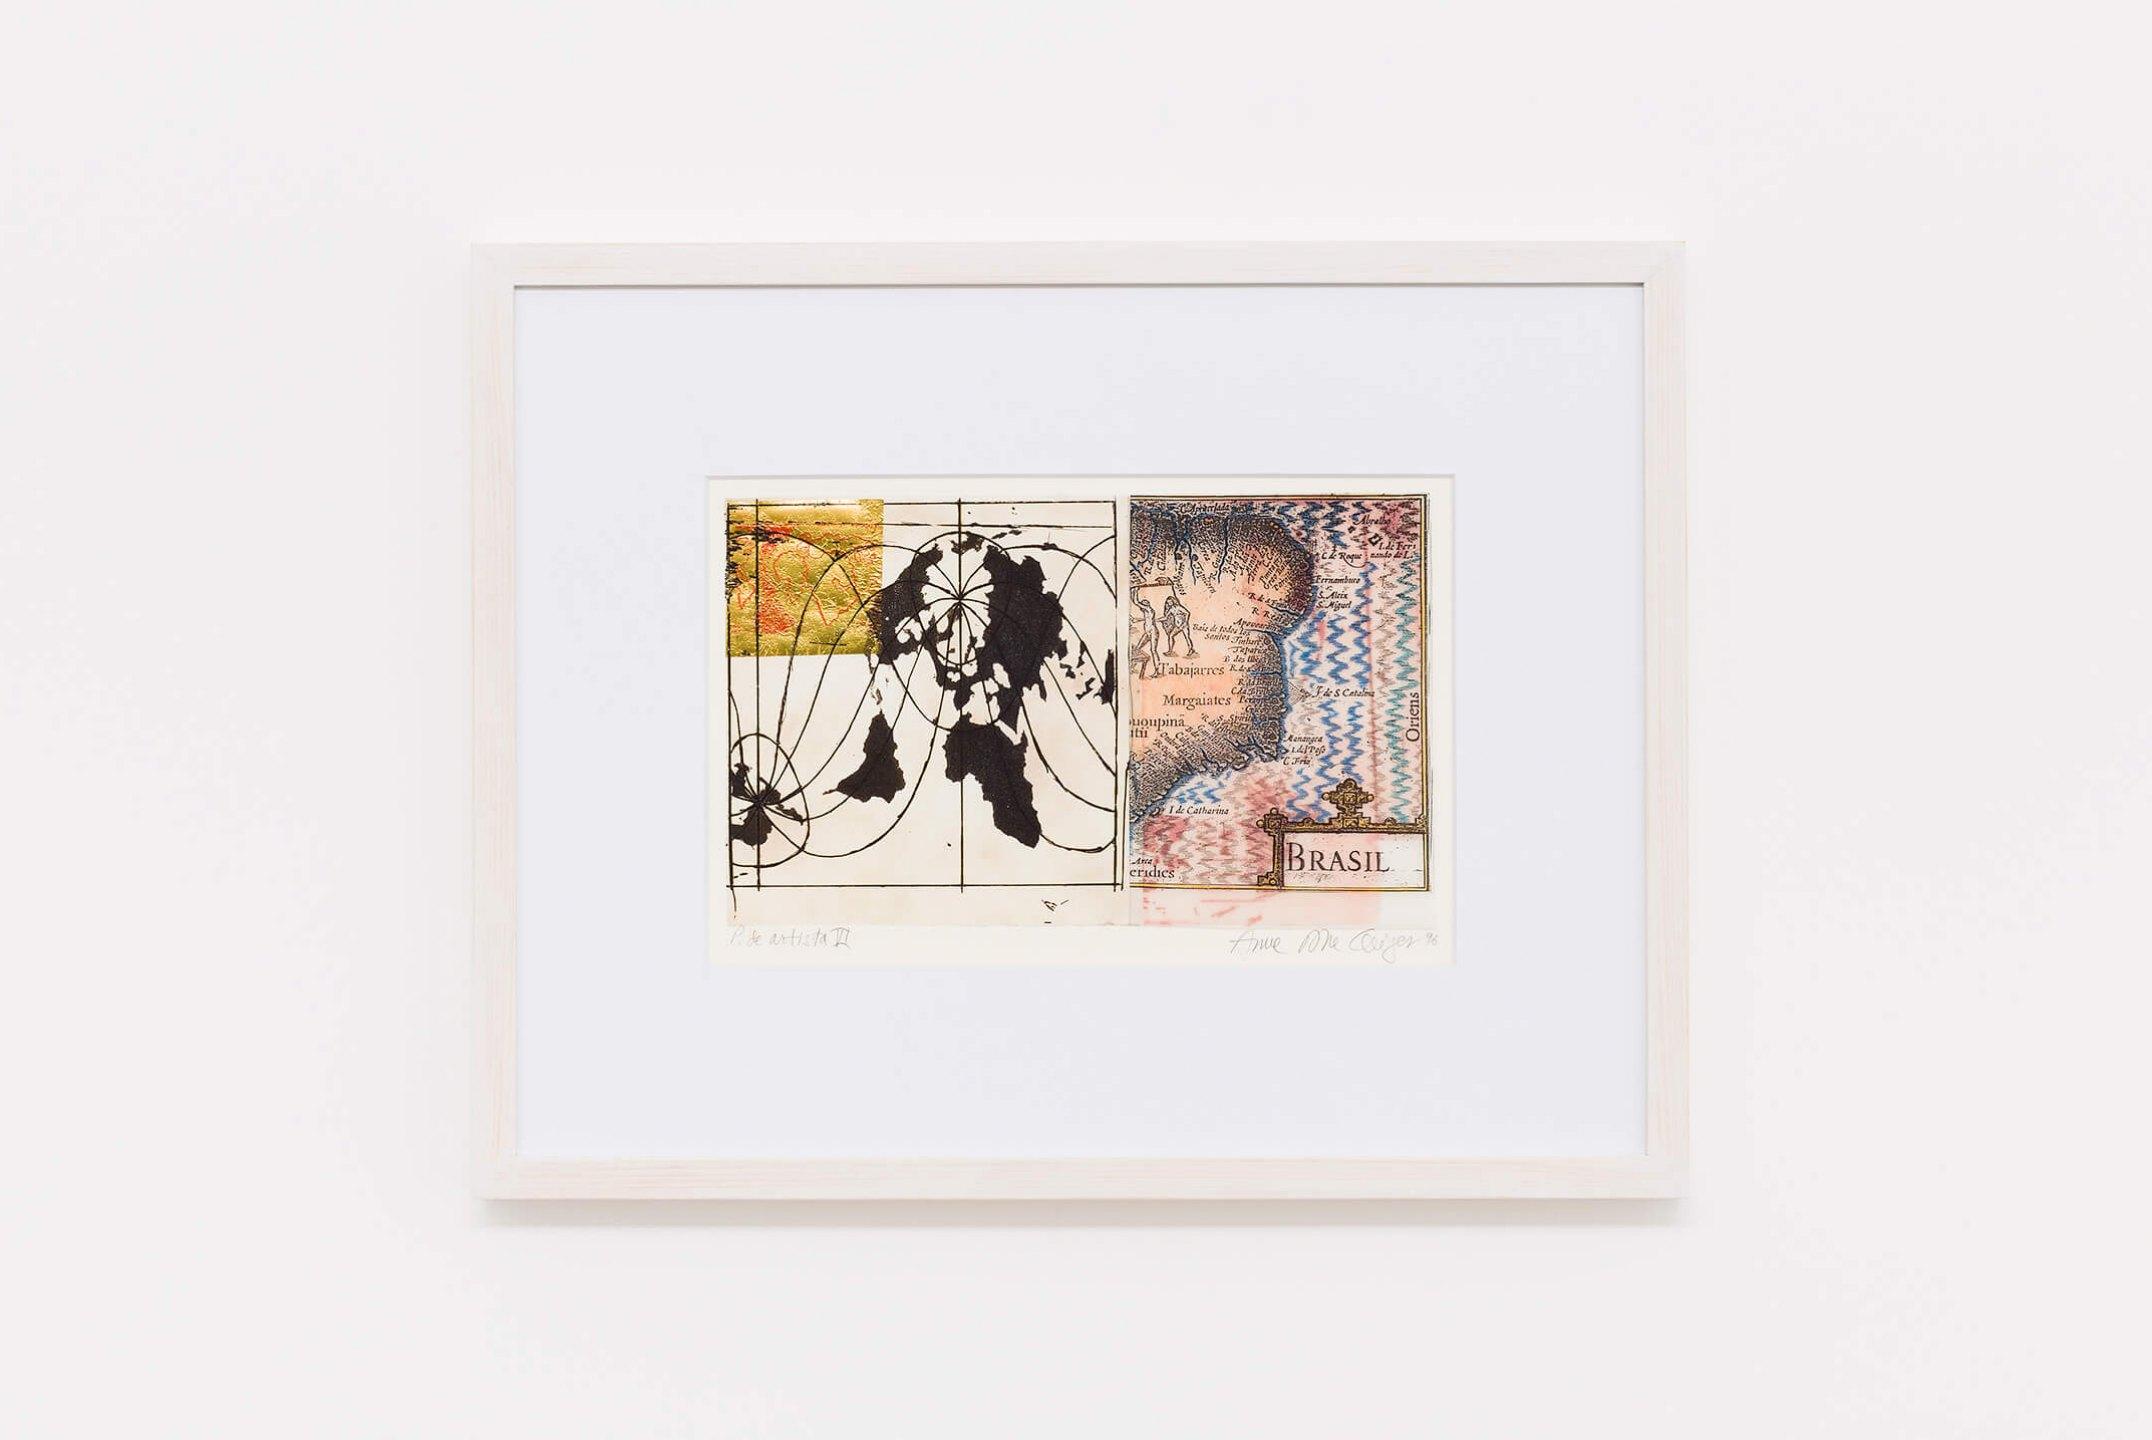 Anna Bella Geiger,&nbsp;<em>Brasil 1500-1995, from Local de ação series</em>, 1995, chalcography, serigraphy, collage and colored pencil, 37&nbsp;×&nbsp;48 cm - Mendes Wood DM